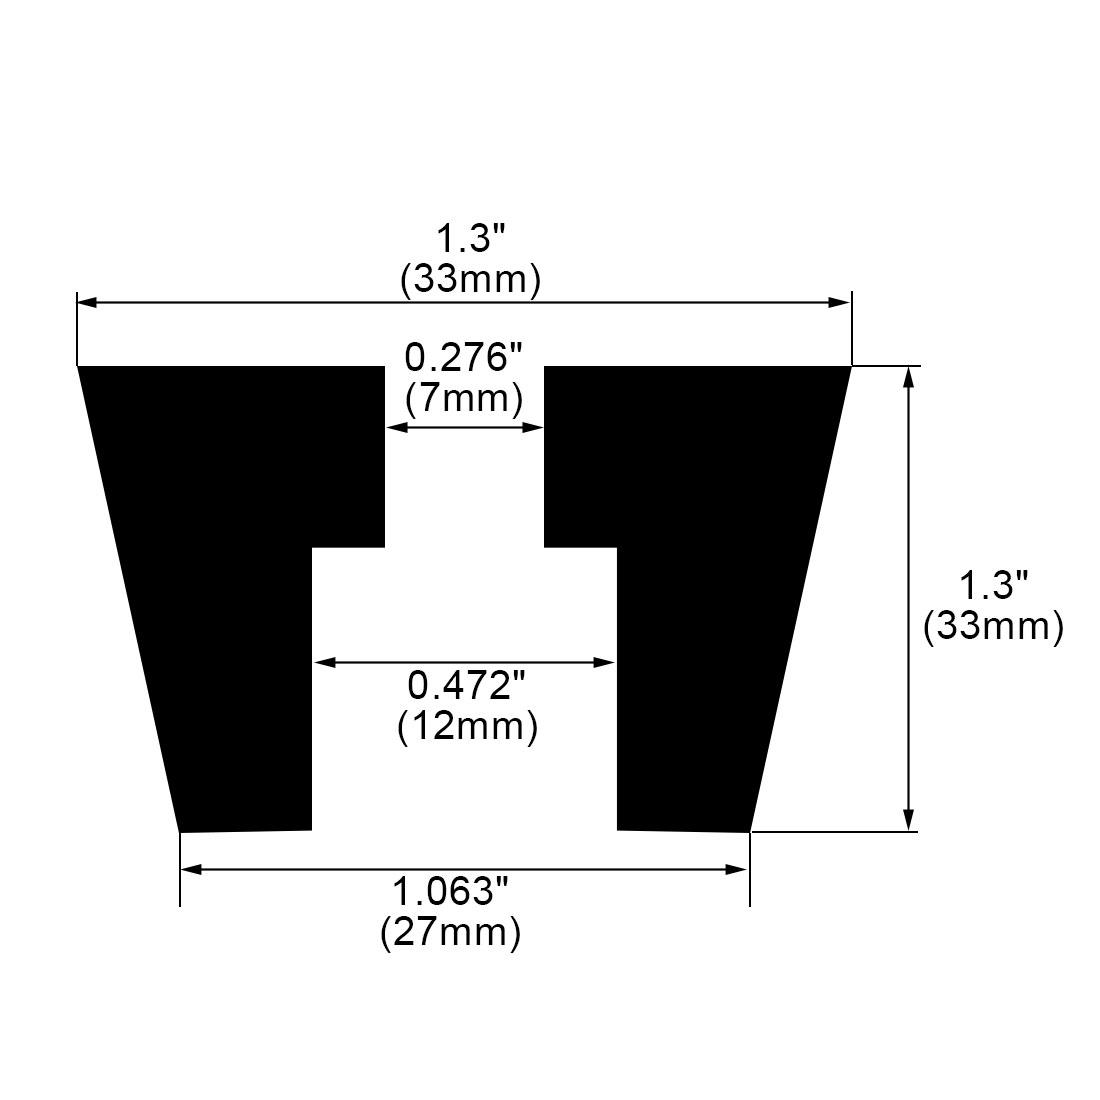 35pcs Rubber Feet Bumper Cabinet Amplifier Speaker Desk Leg Pads, D33x27xH33mm - image 1 of 7